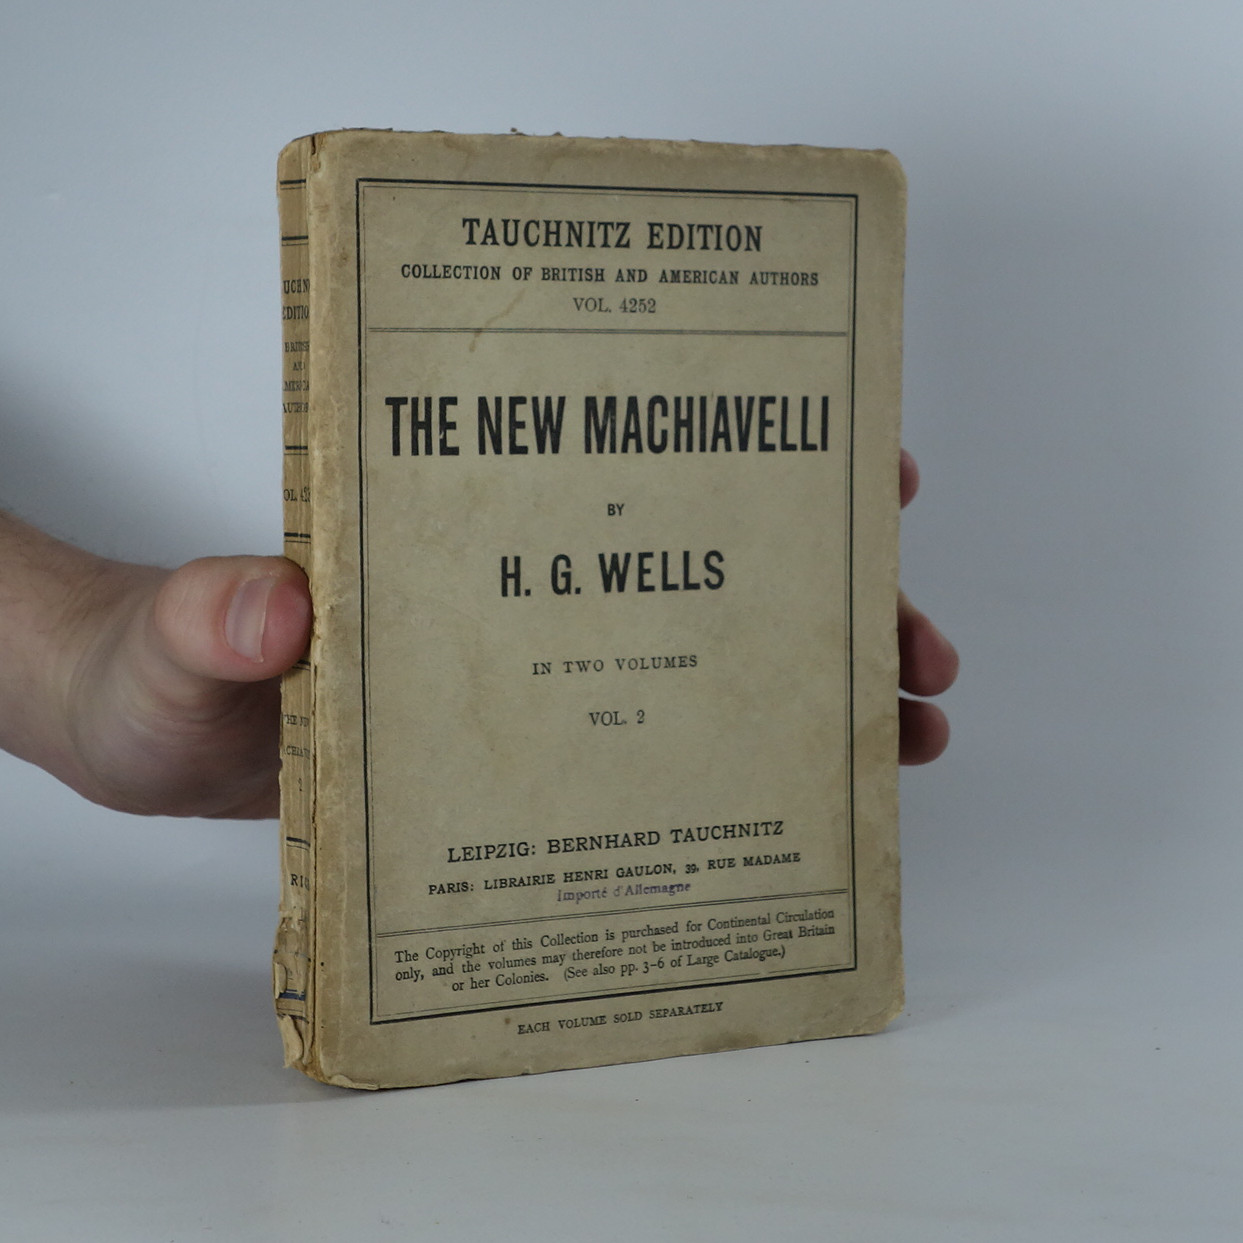 antikvární kniha The new machiavelli. Vol. 2, 1911